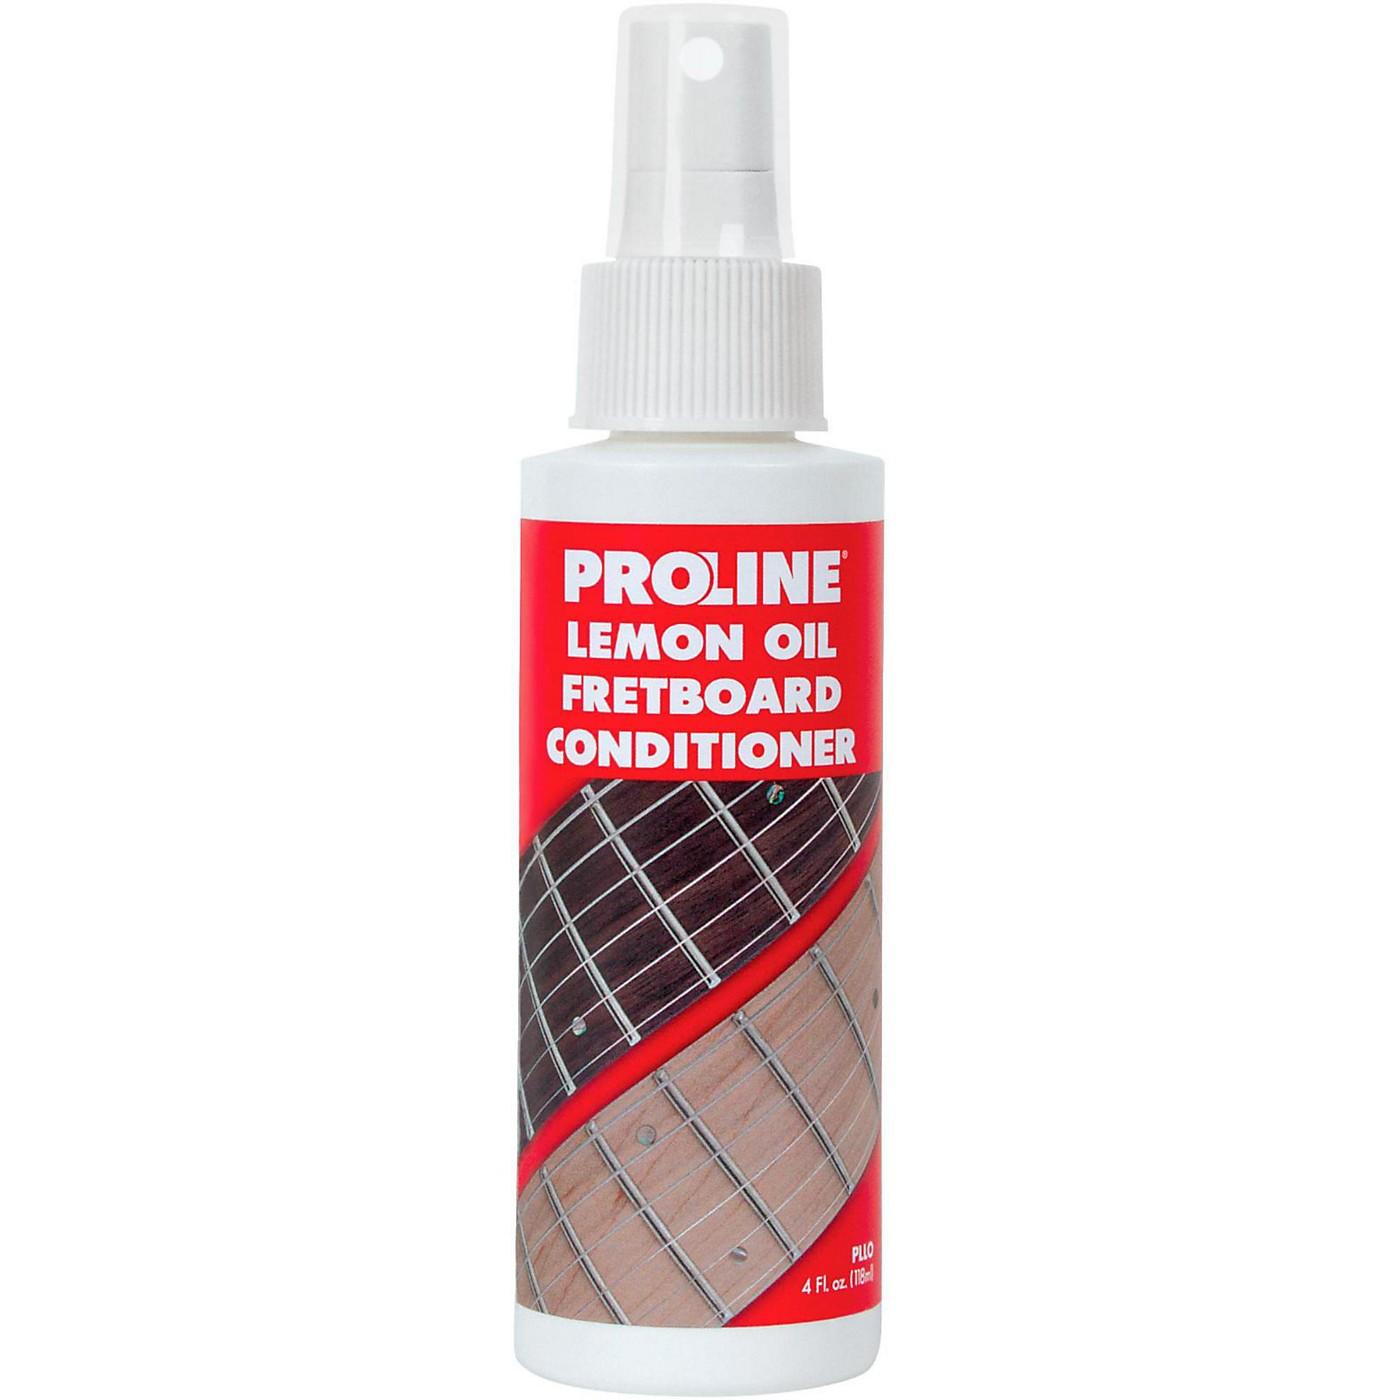 Proline Lemon Oil Fretboard Conditioner thumbnail